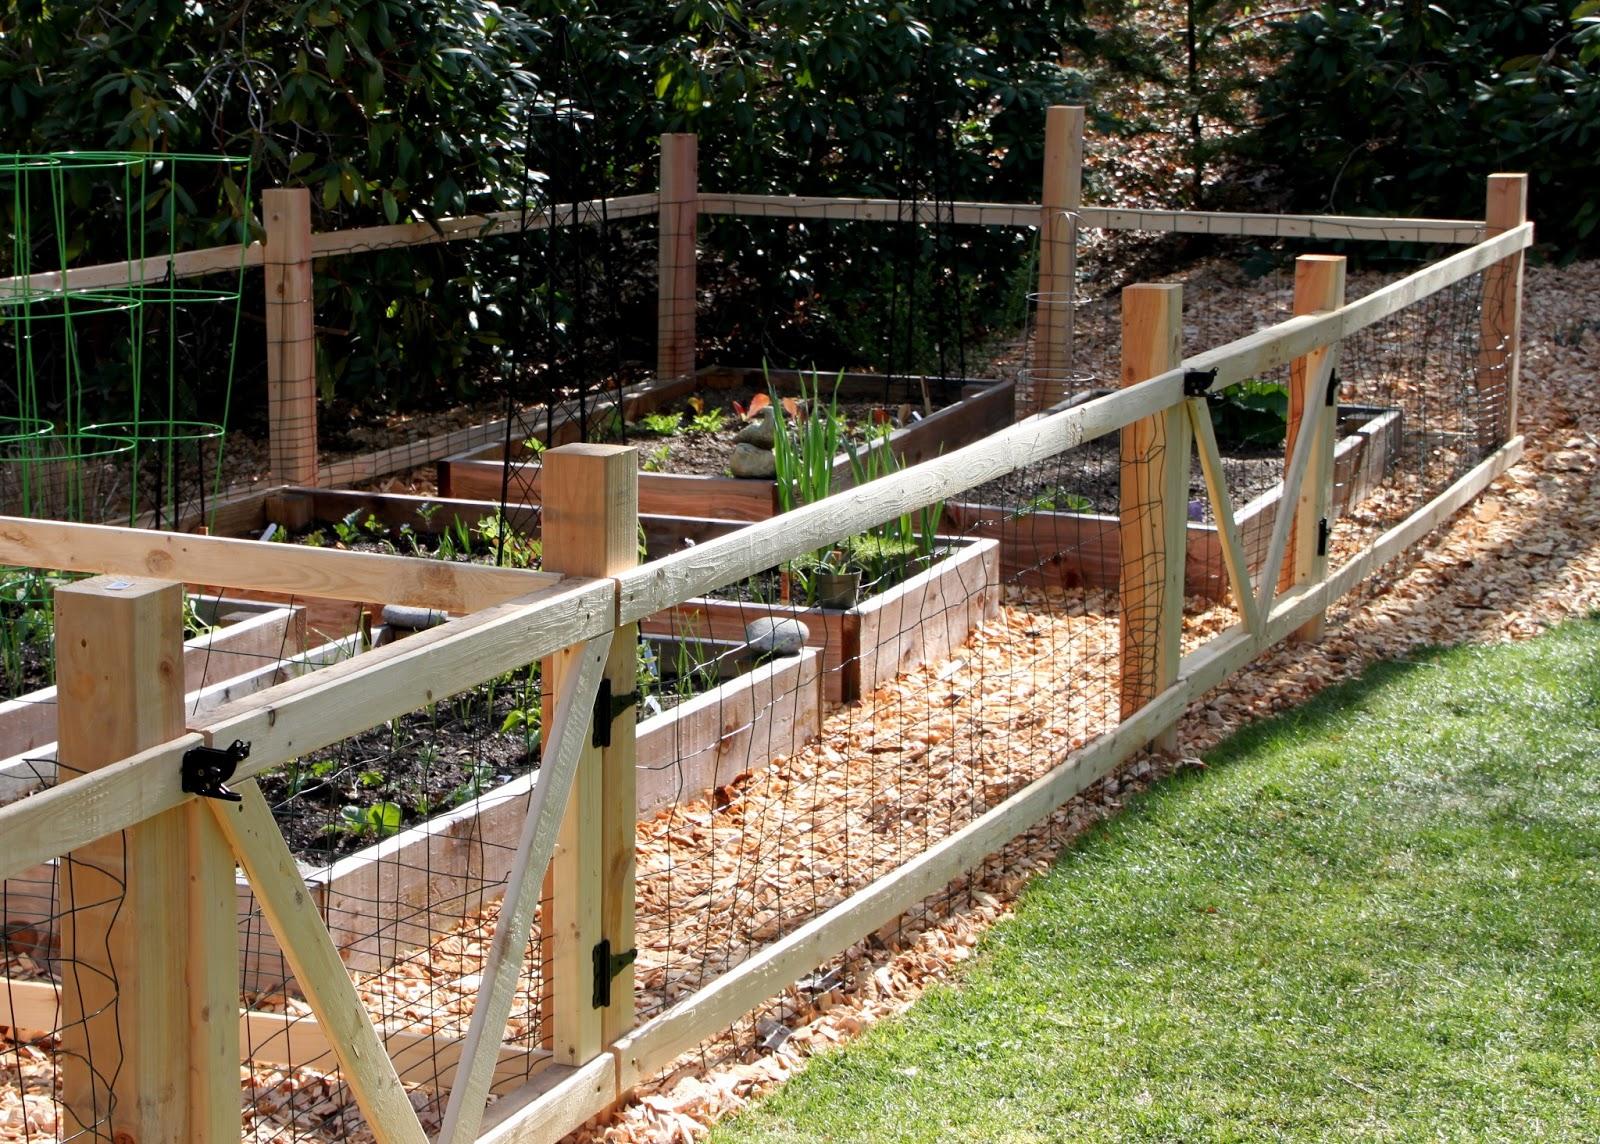 Famed A Garden Fence A Garden Fence Nest Small Garden Fence Ideas Ken Wire Small Garden Fence Canada garden Small Garden Fence